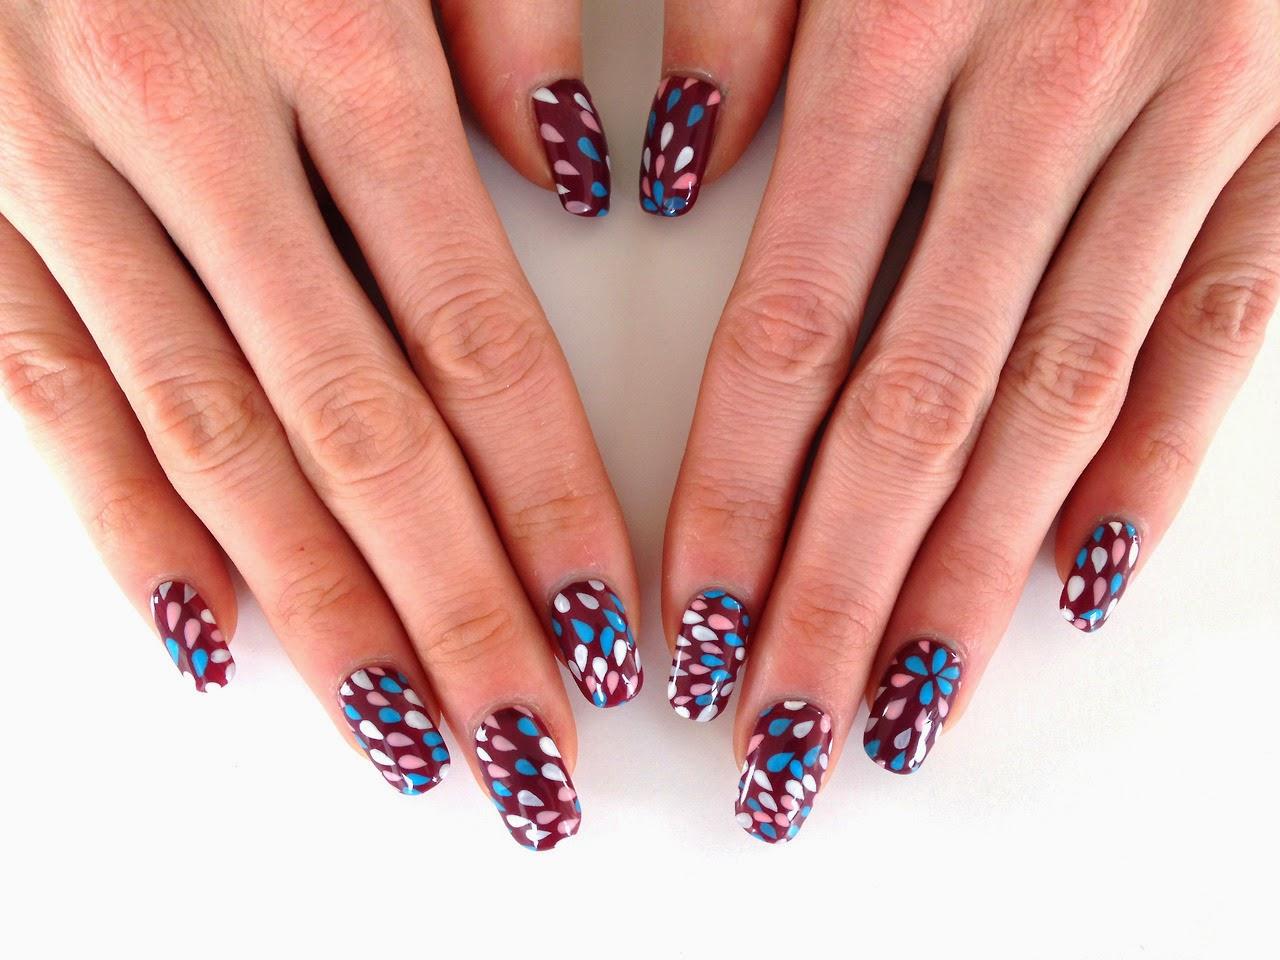 Nails Art: BloggHer : Susi Kenna: Nail Art History In New York